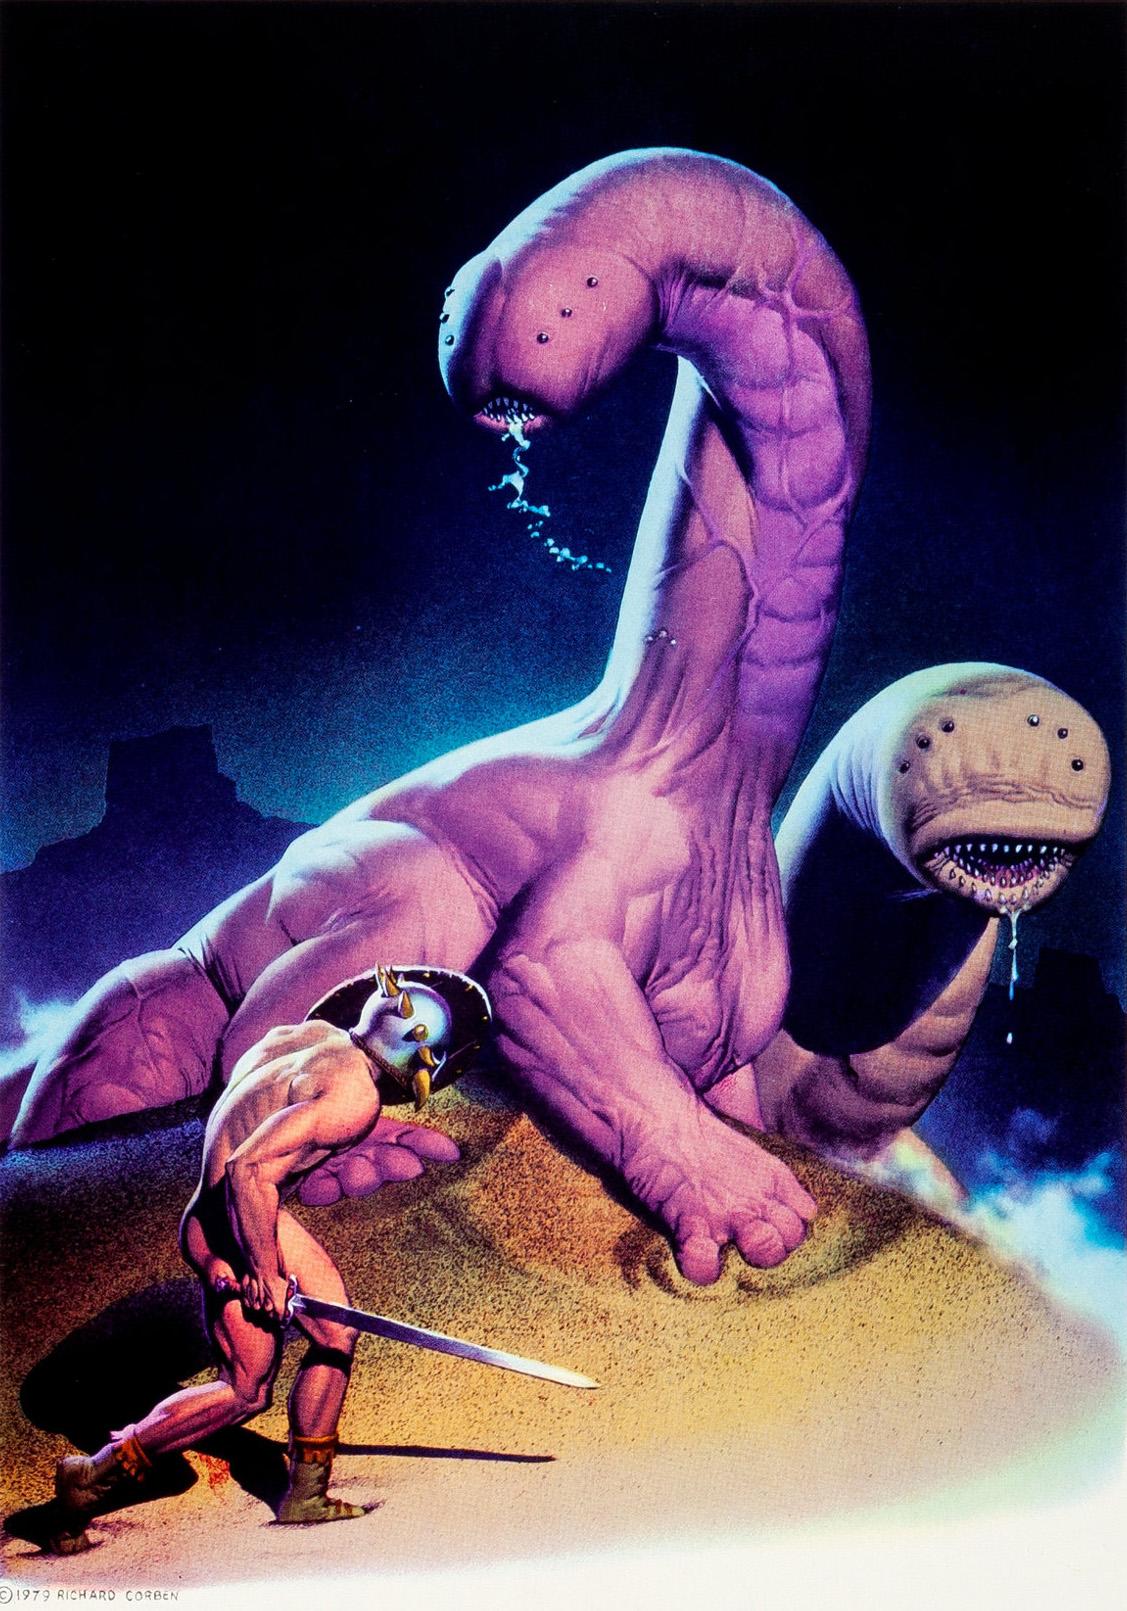 Richard Corben - Scenes from the Magic Planet Portfolio Print, 1979